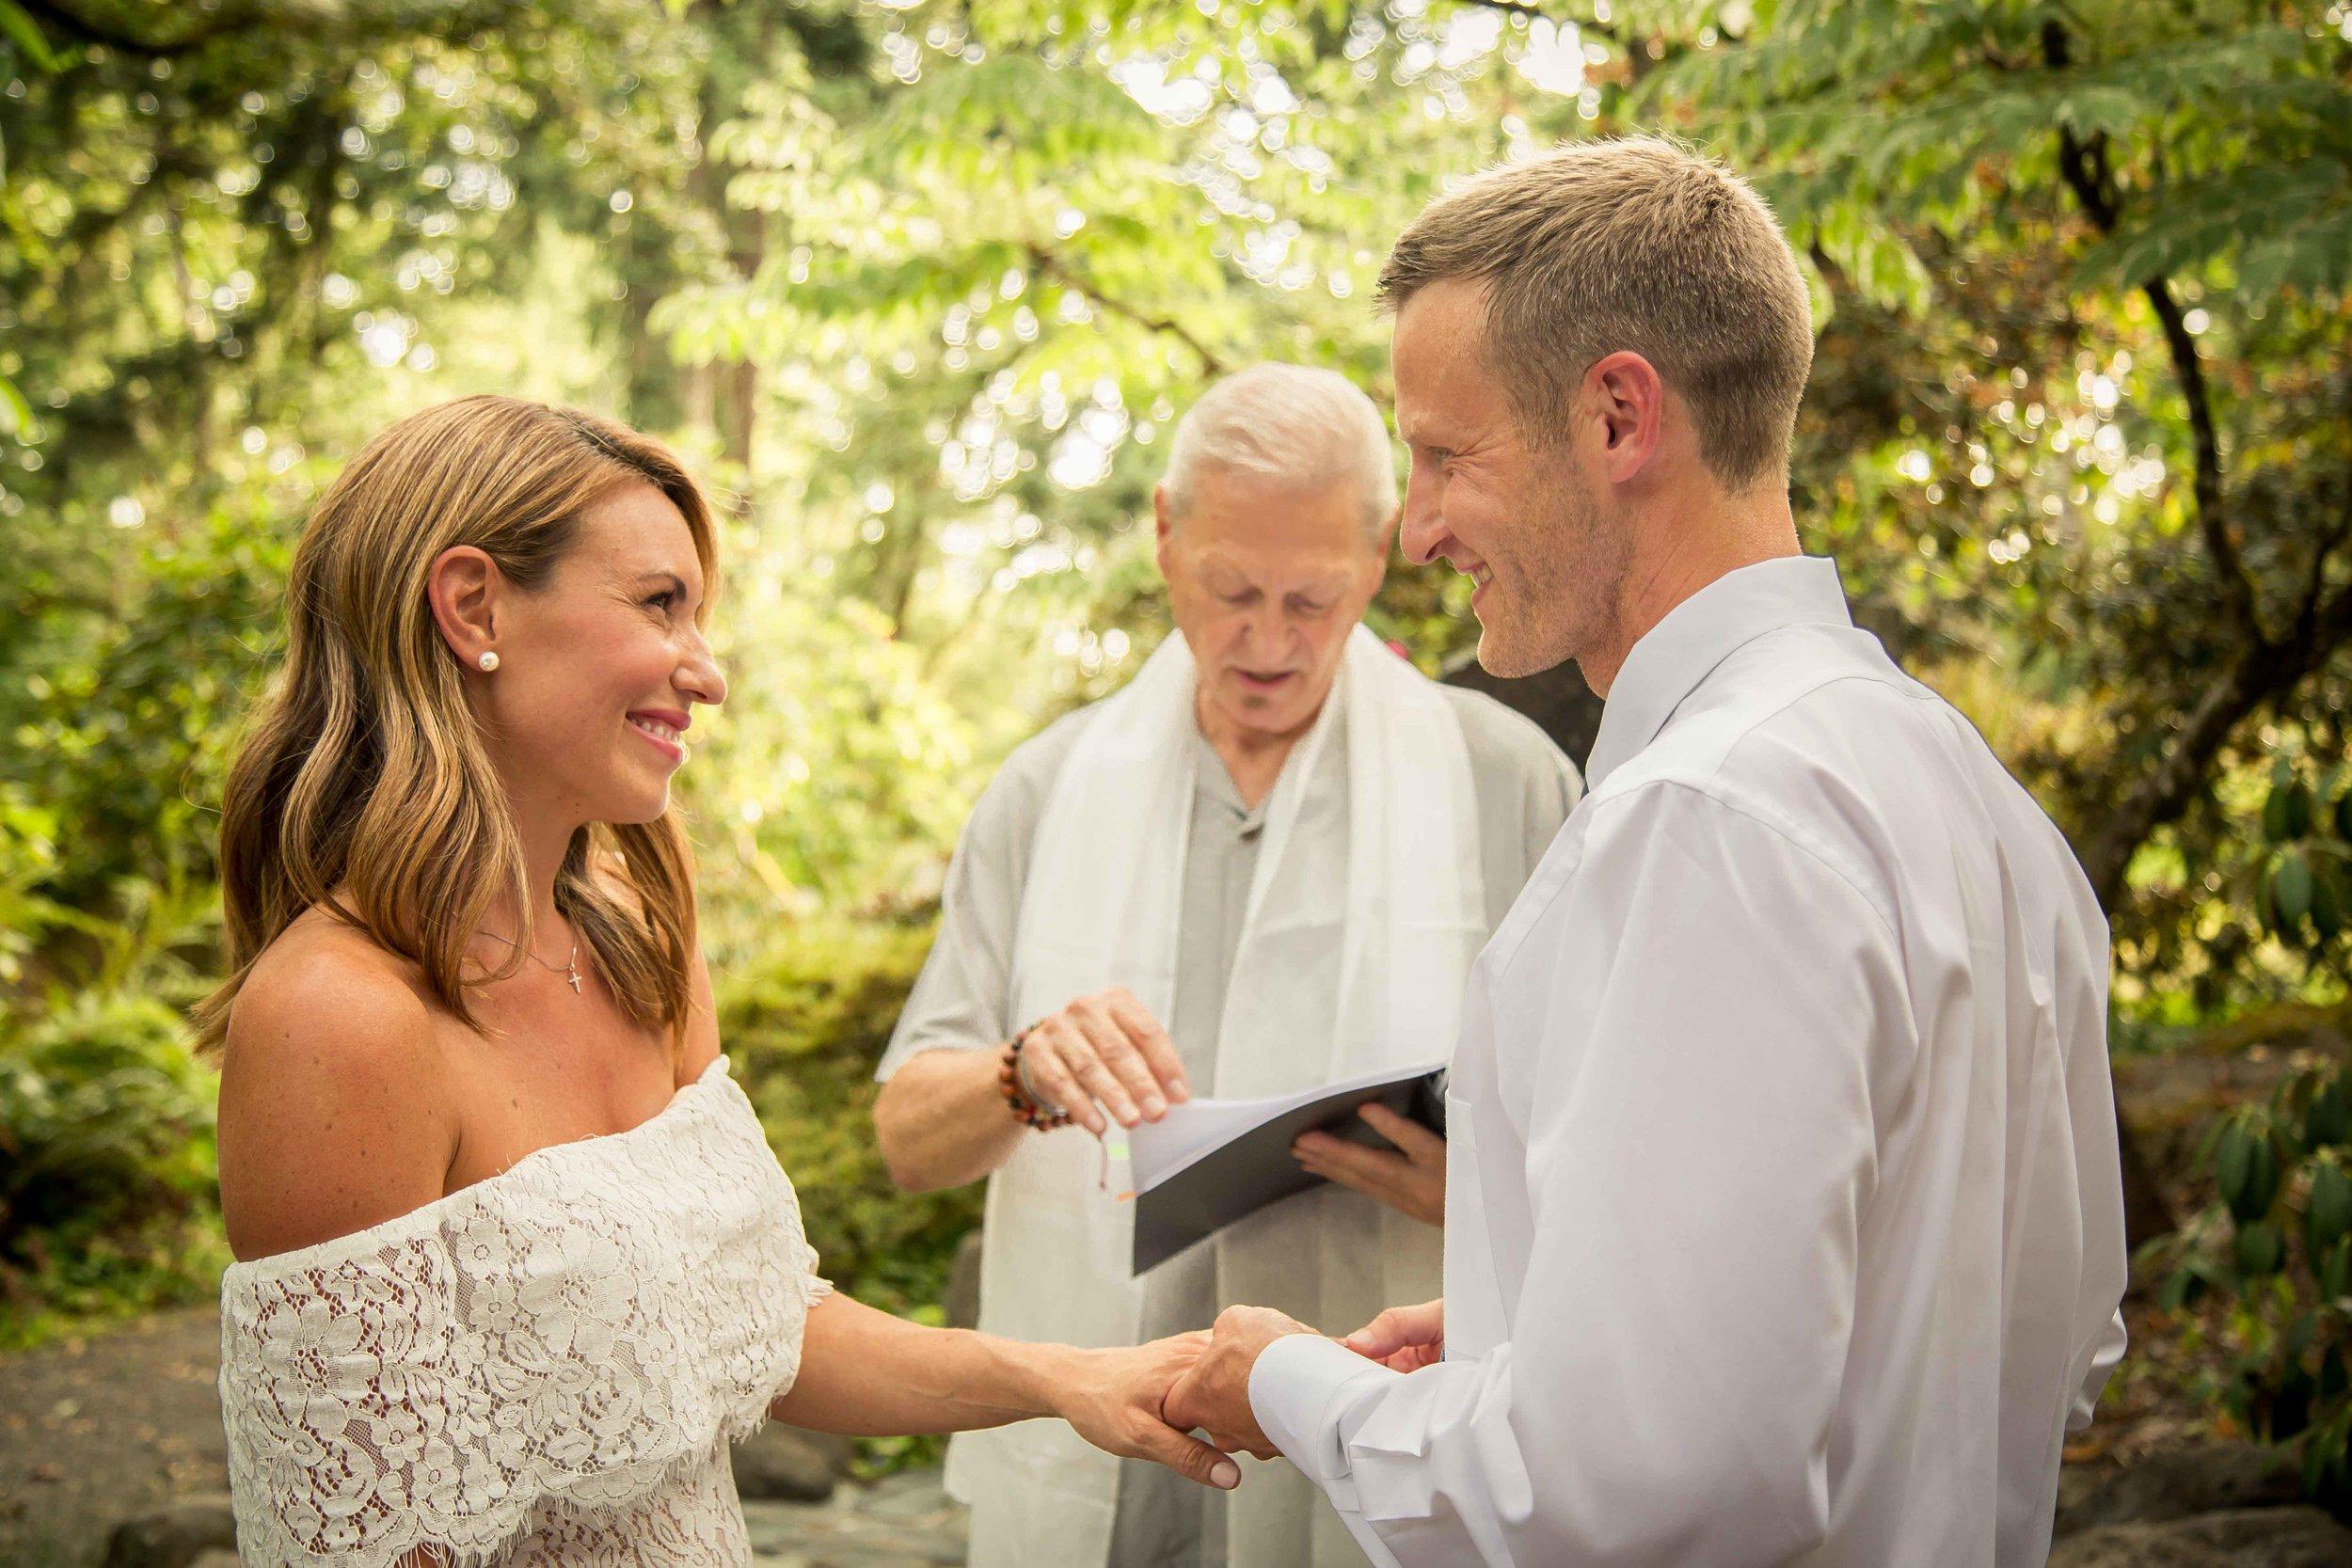 Ceremony Chelsea and John - DillonVibes Photography-1.jpg